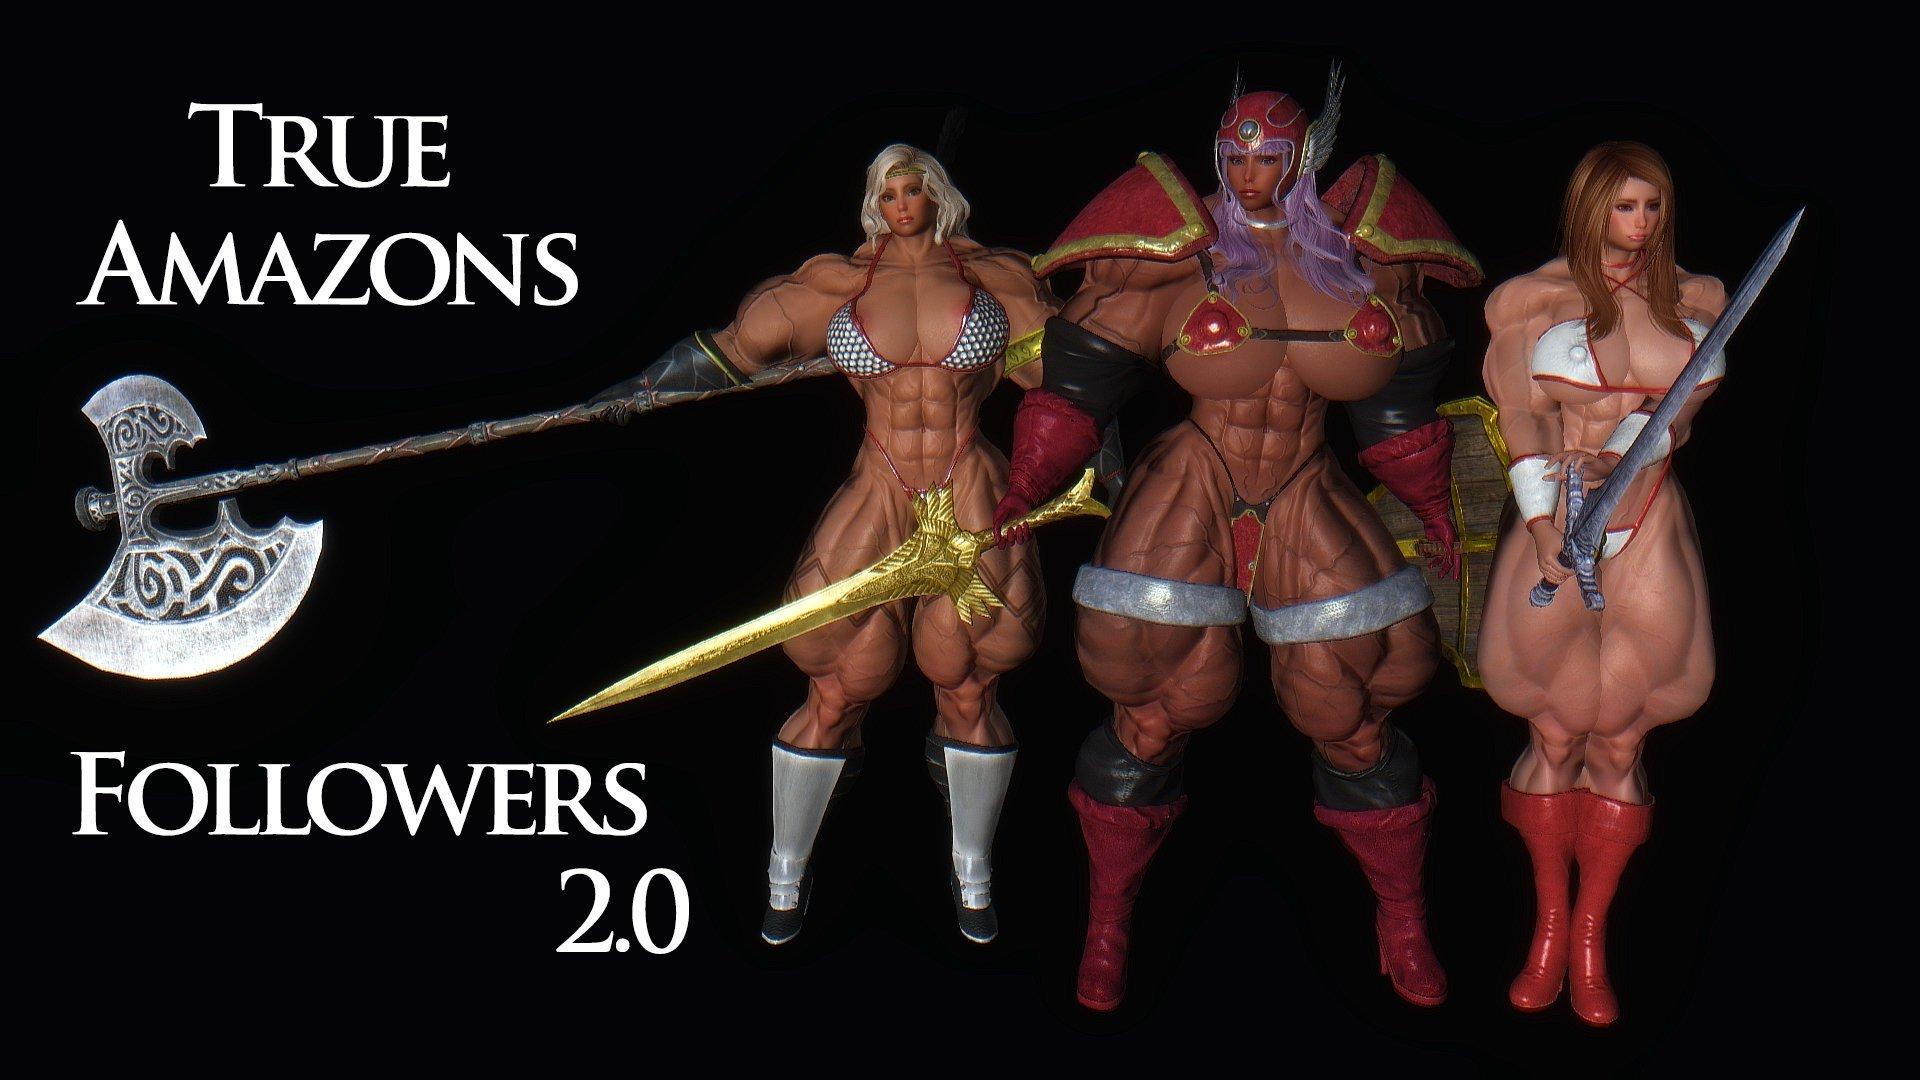 True Amazons Follower ru